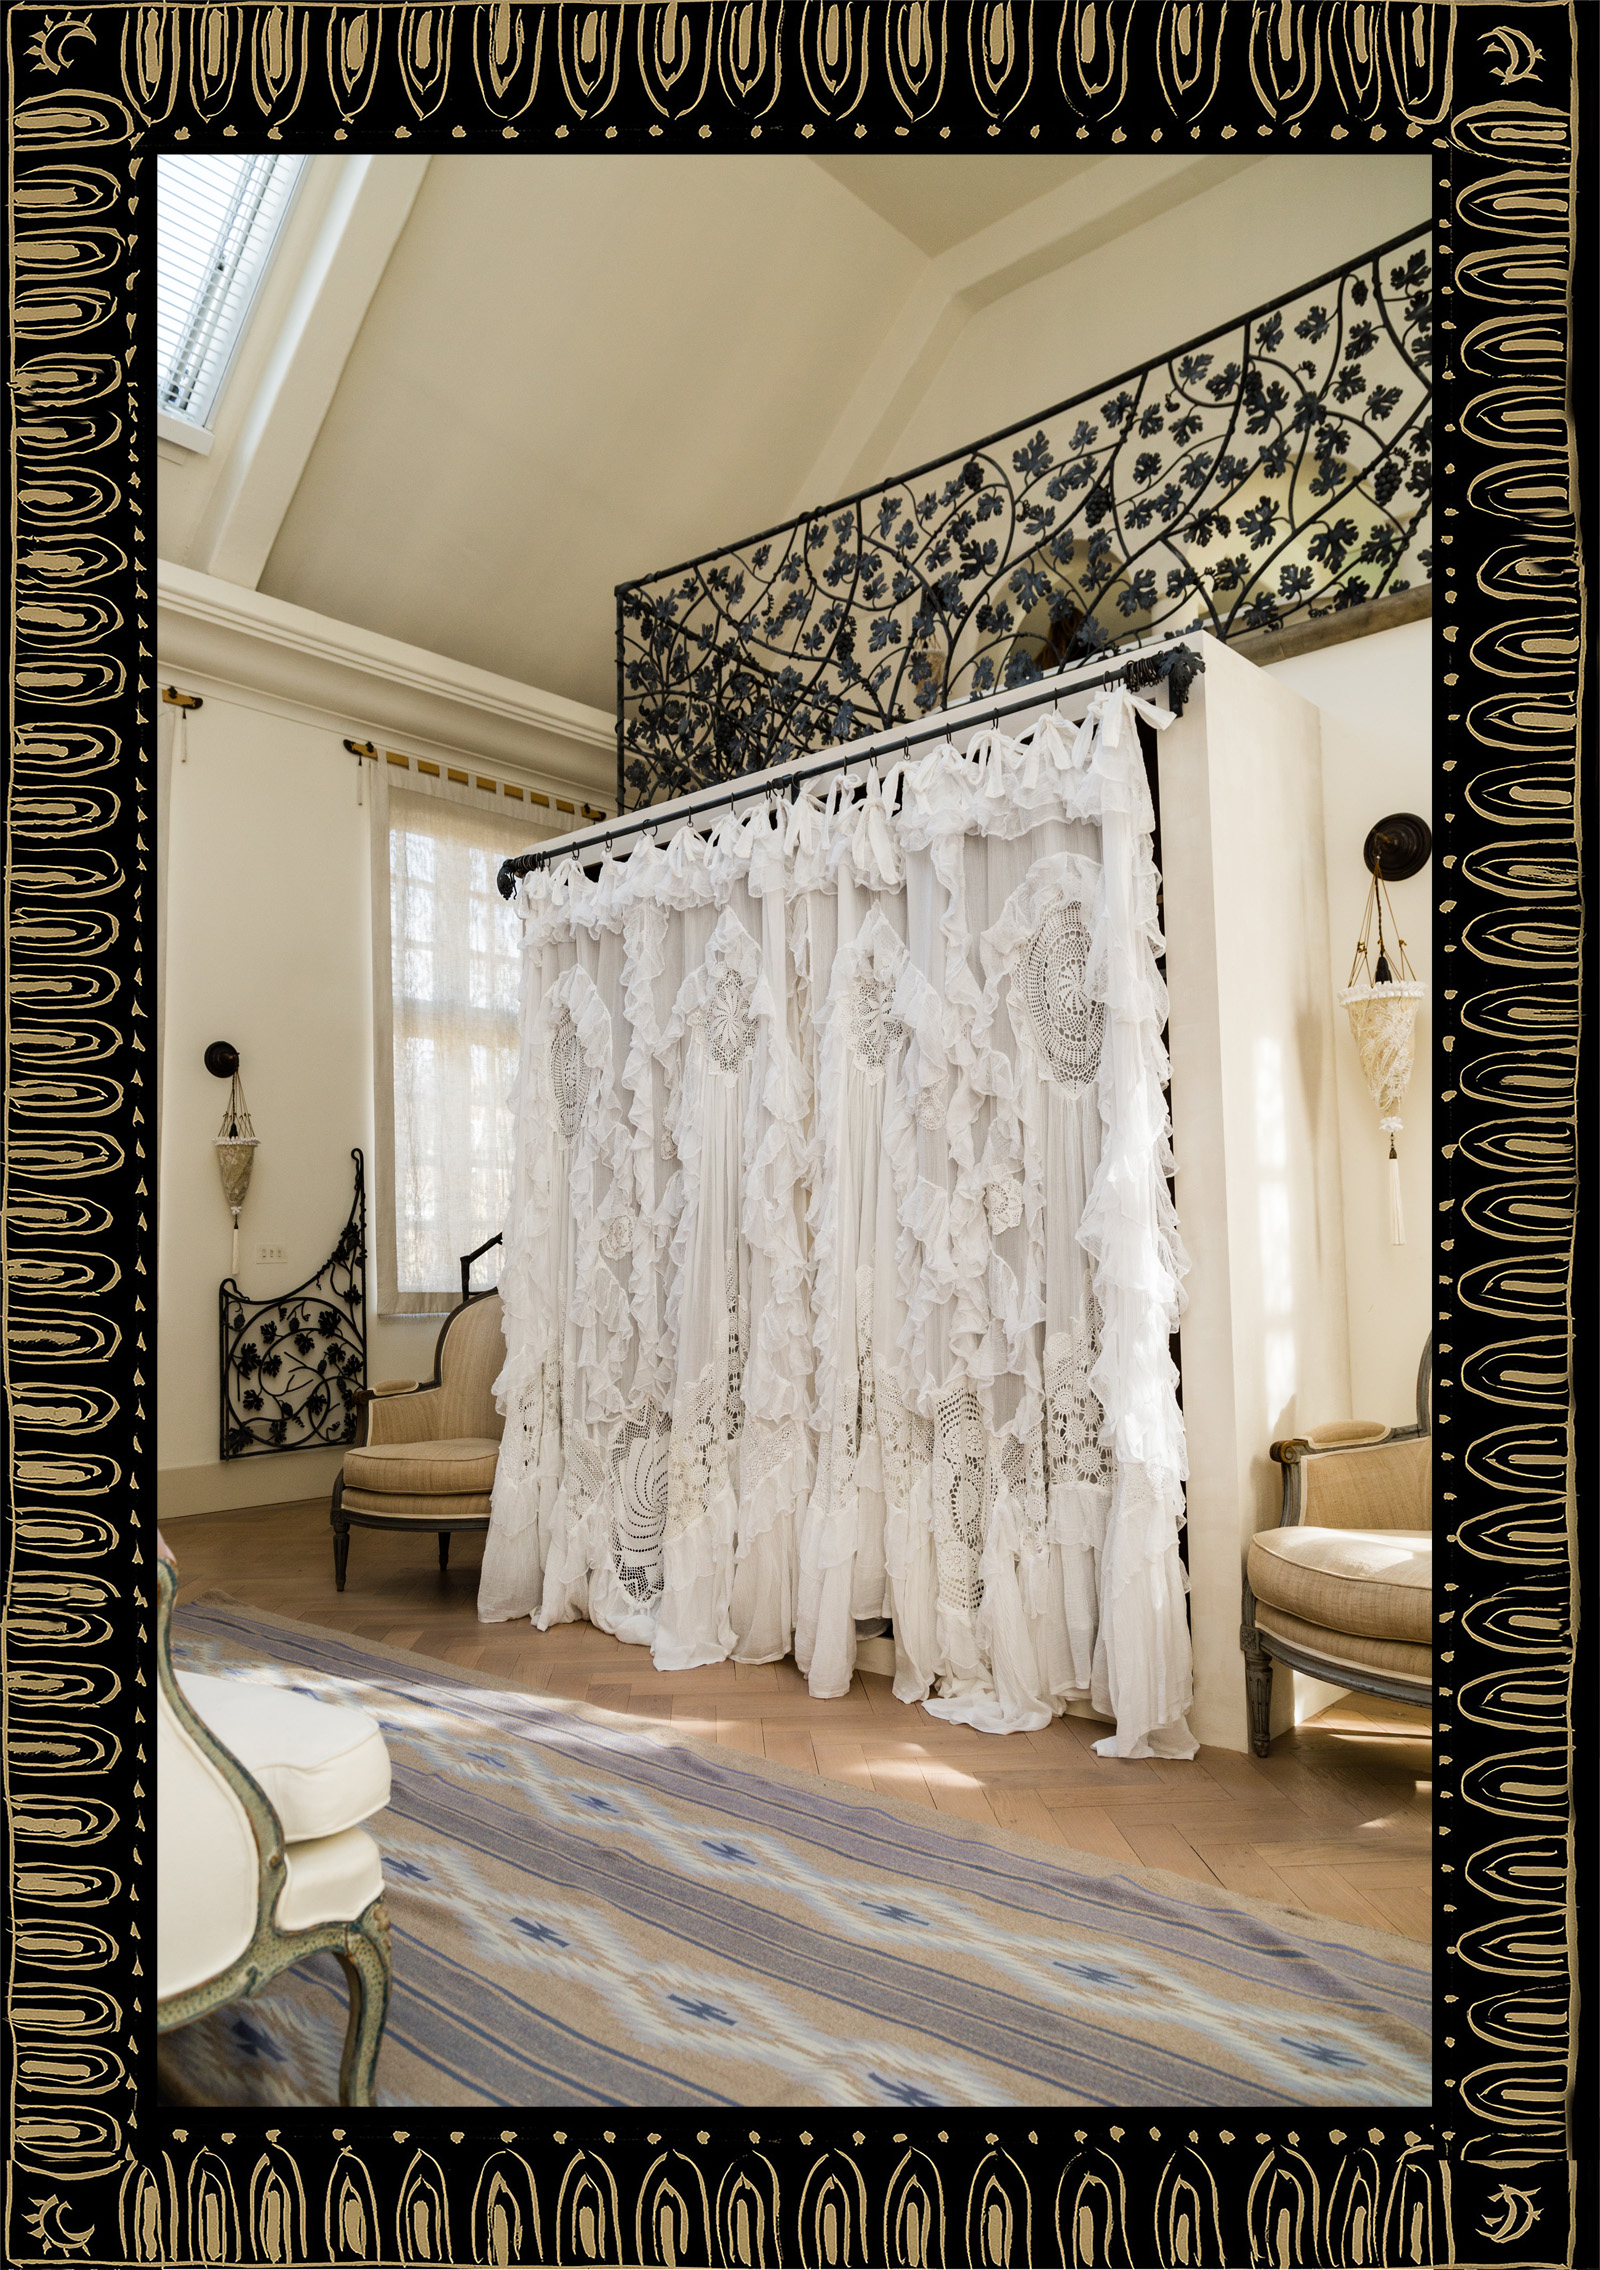 Curtain-36.jpg